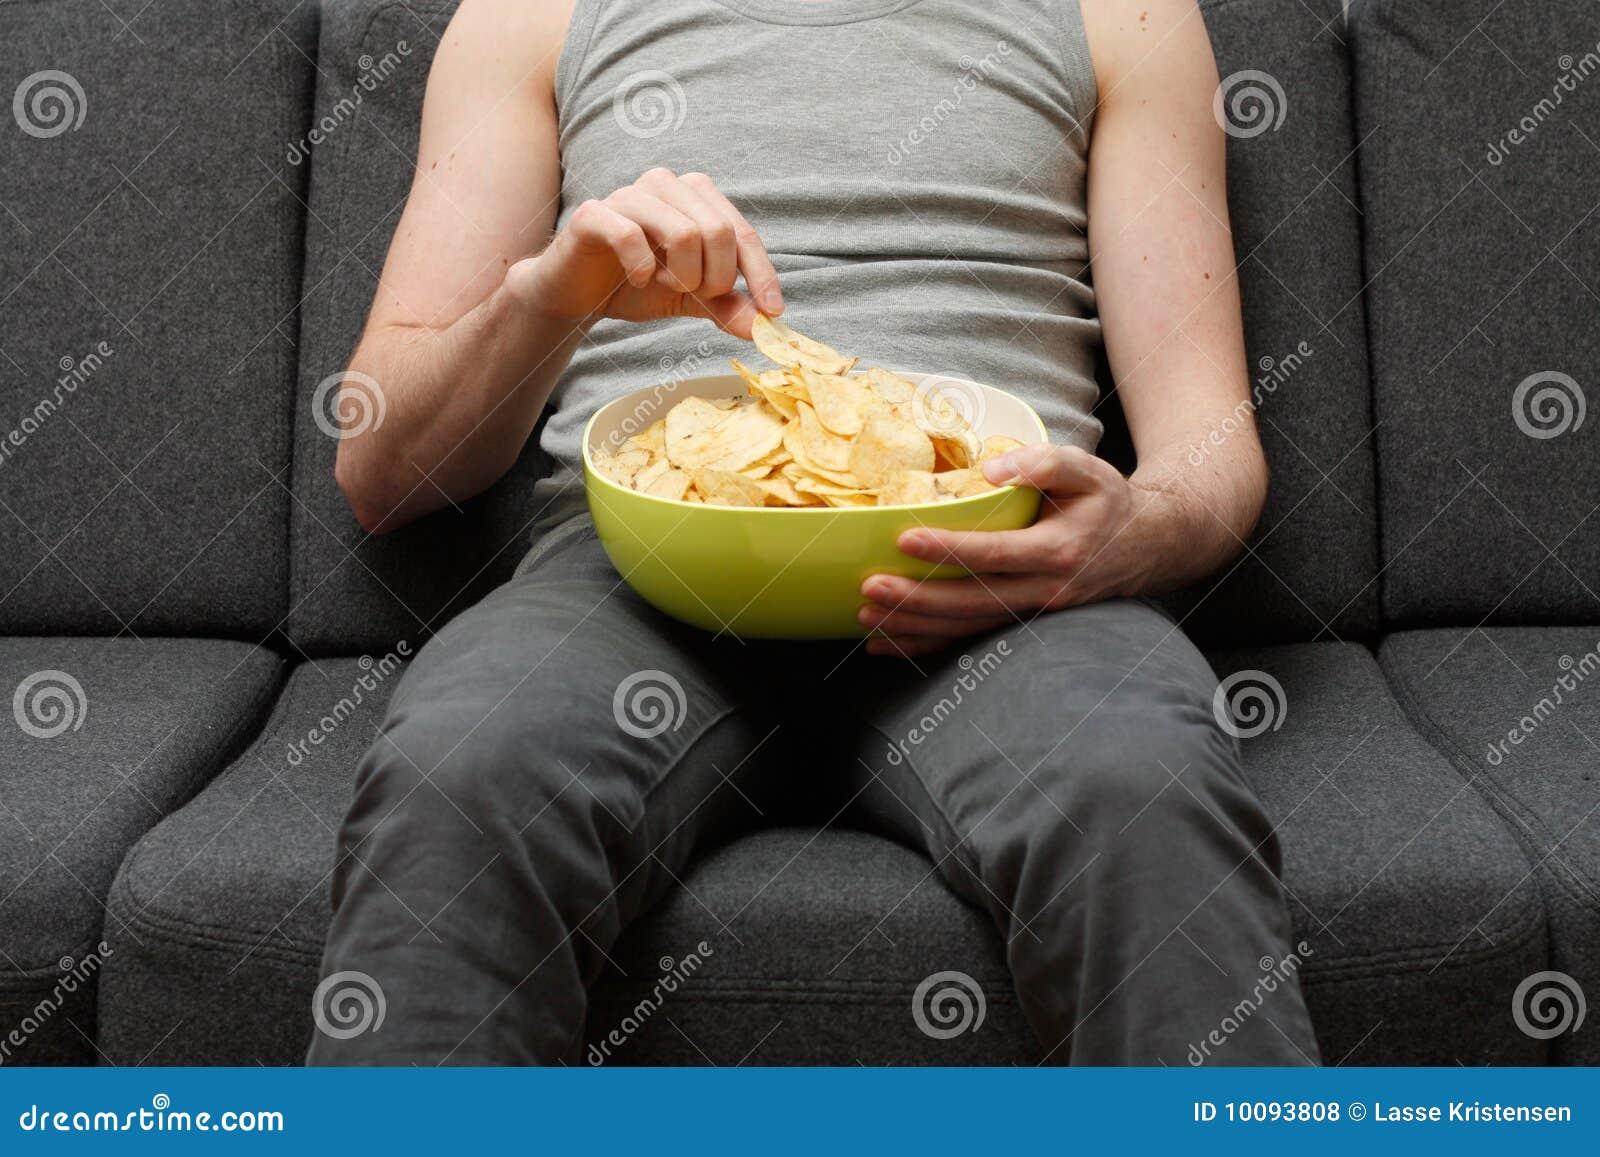 Man Eating Chips Royalty Free Stock Photos Image 10093808